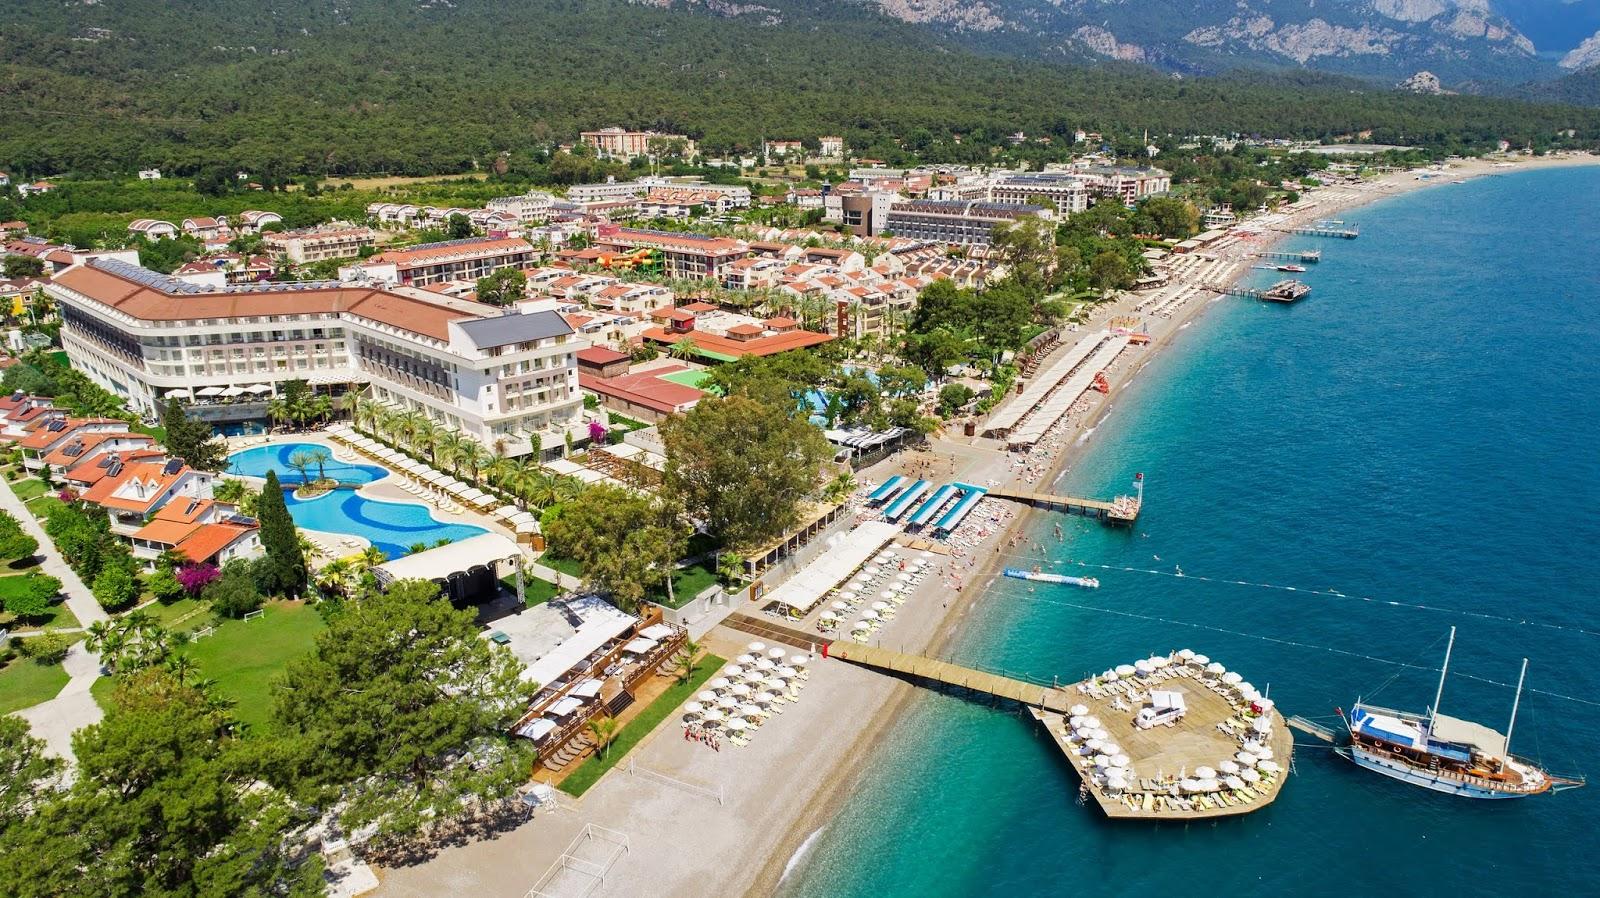 [Resim: DoubleTree-by-Hilton-Antalya-Kemer-Genel-235676.jpg]